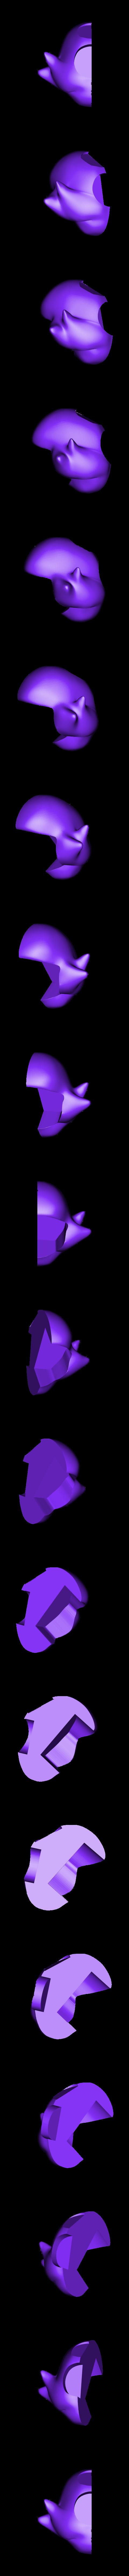 hair_right.stl Download free STL file Princess Peach from Mario games - multi-color • 3D print design, bpitanga